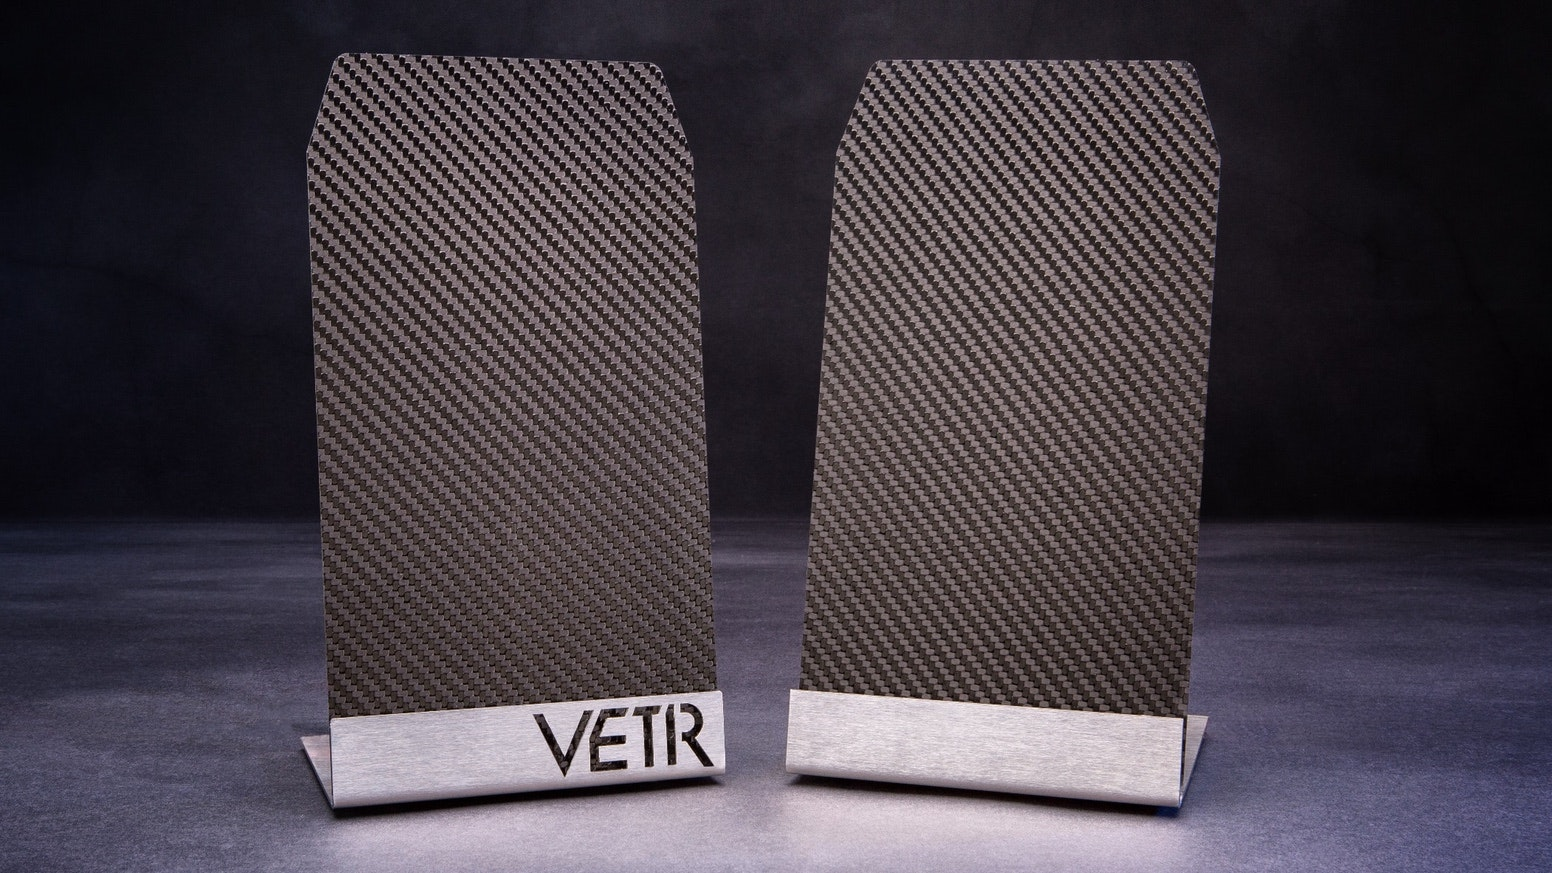 PANL1 Speaker System By VETR Audio   Ditch The Box by VETR Audio —  Kickstarter